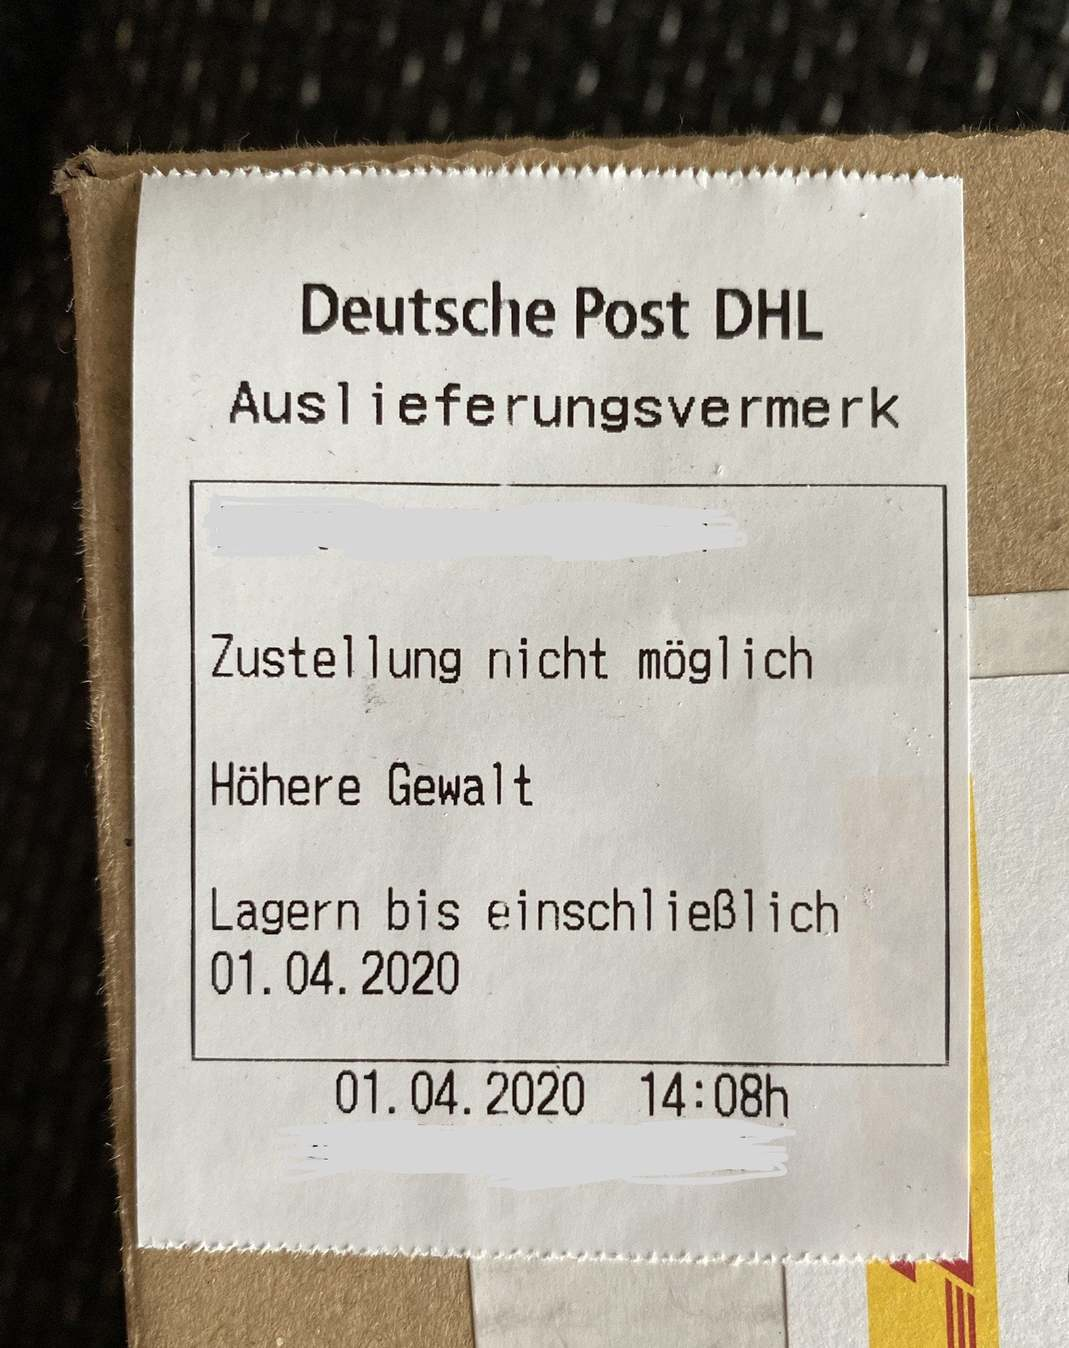 DHL - Höhere Gewalt